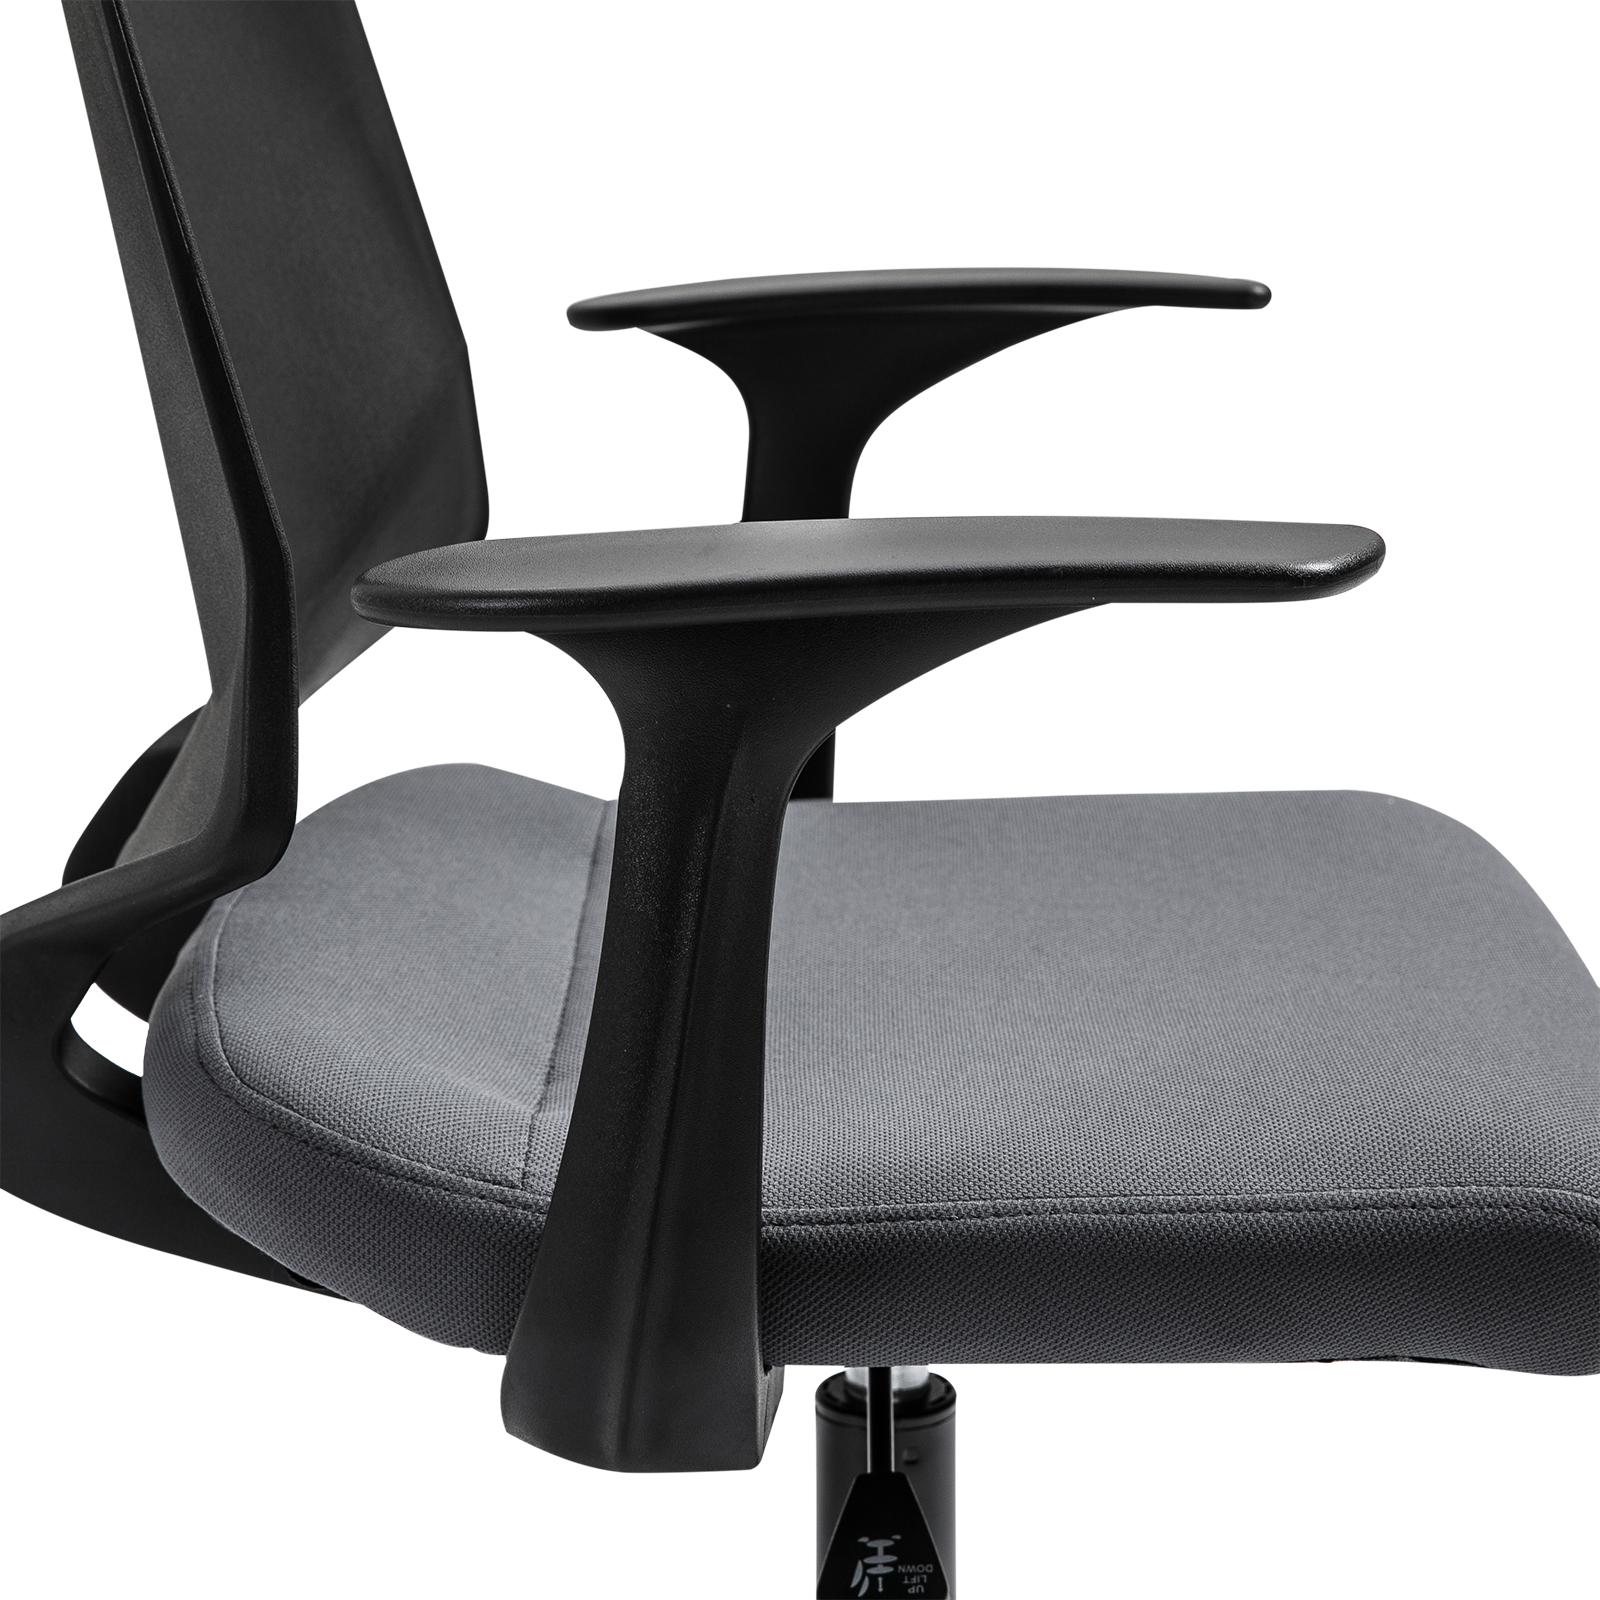 Bürostuhl Drehstuhl Chefsessel Stoffsessel Netzbezug rollbar höhenverstellbar